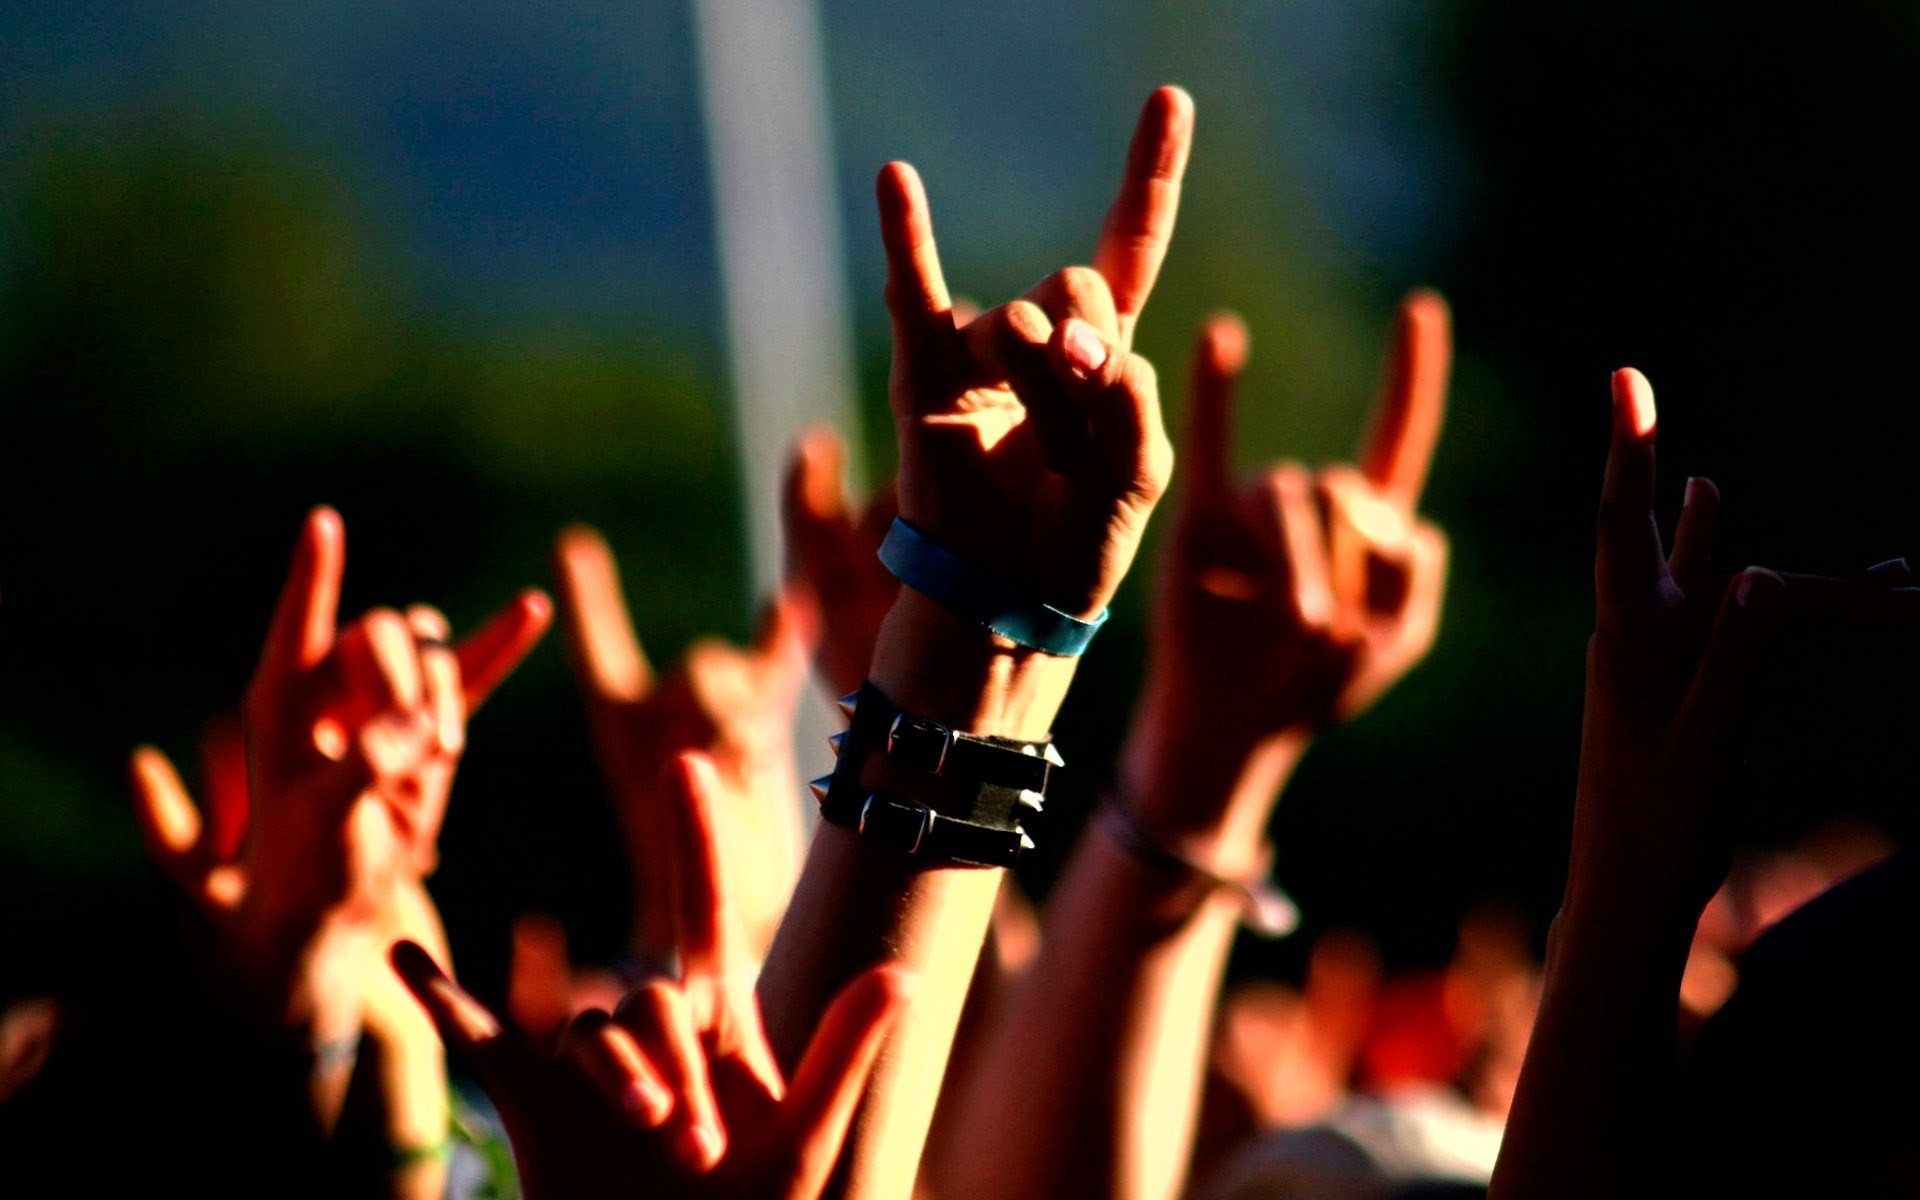 Music Concert Metal Horns Hand Signs Wide 69116 HD Wallpaper Res 1920x1200